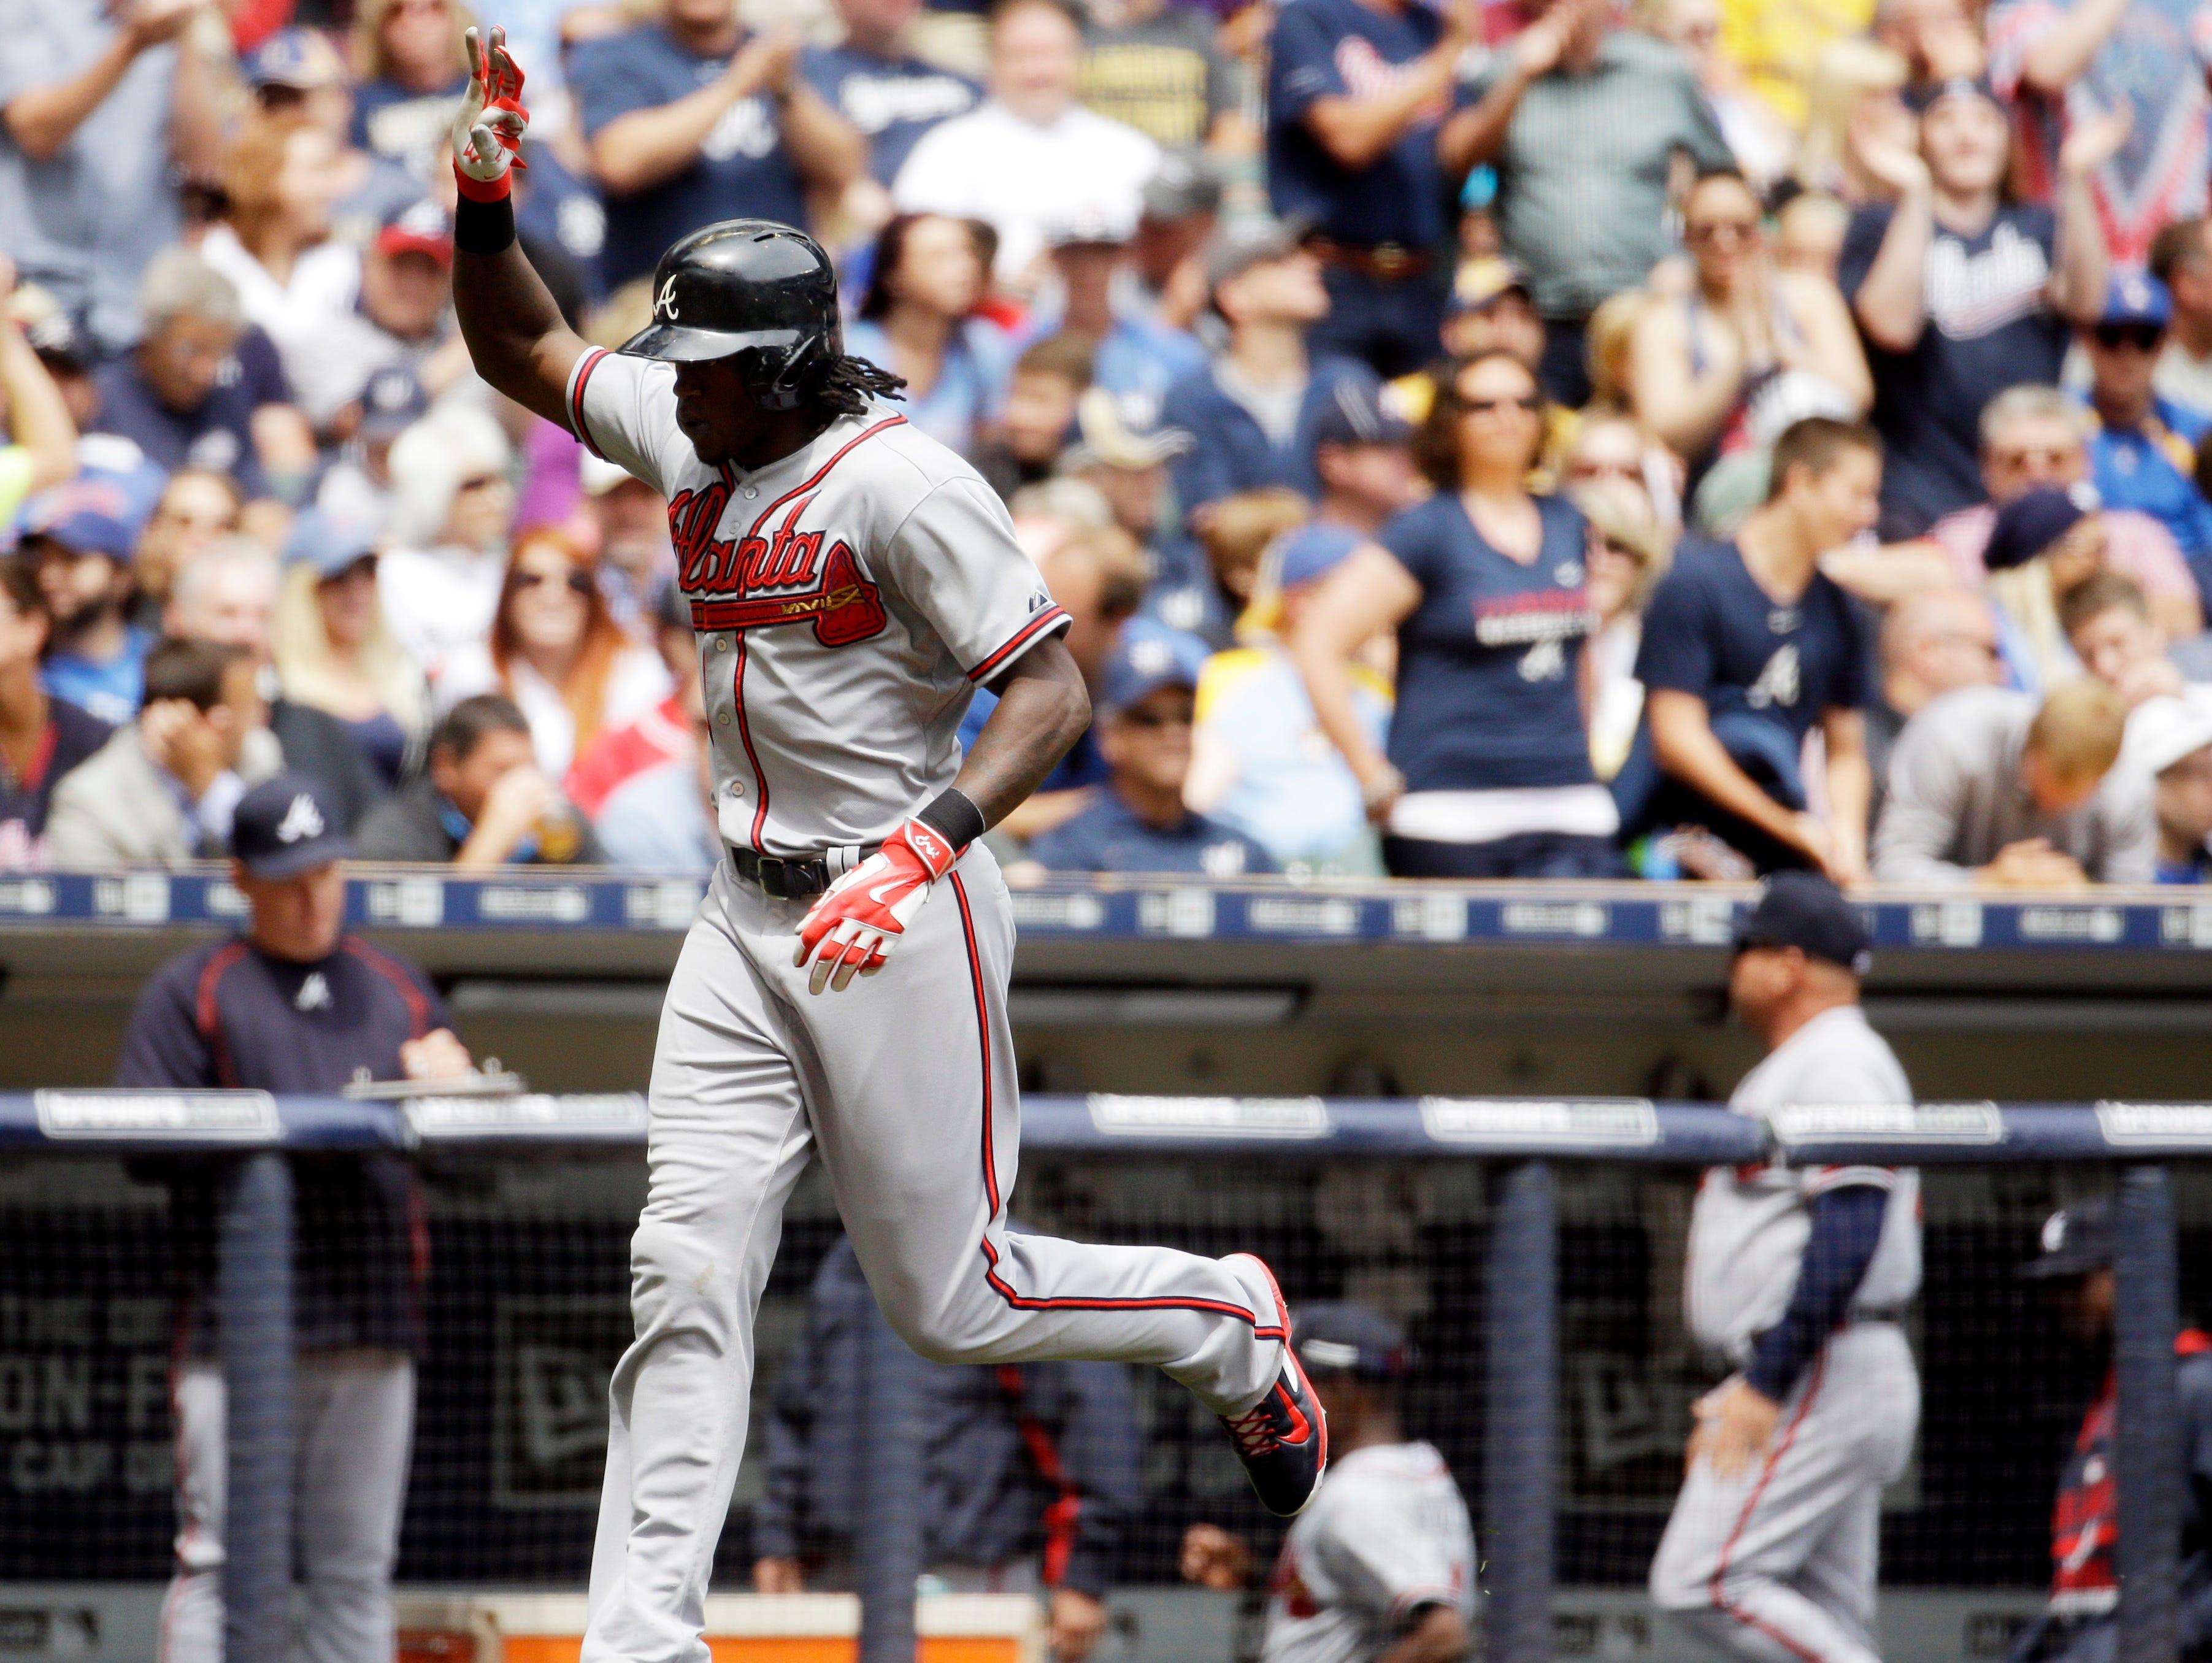 Roberson graduate Cameron Maybin hit his eighth home run of the season Wednesday in Milwaukee.